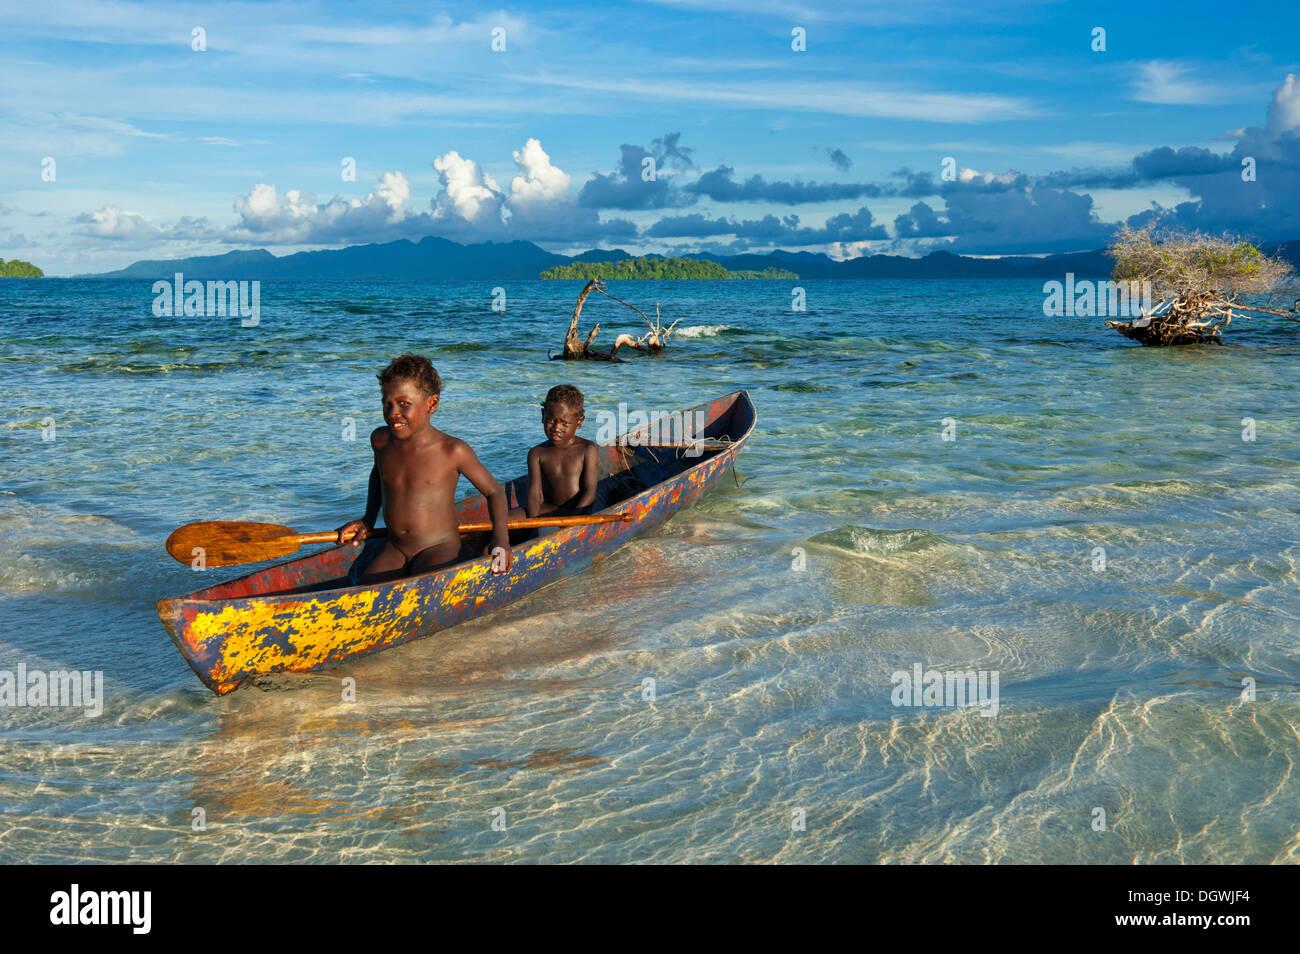 Boys in a canoe in the Marovo Lagoon, Marovo Lagoon, Western Province, Solomon Islands - Stock Image